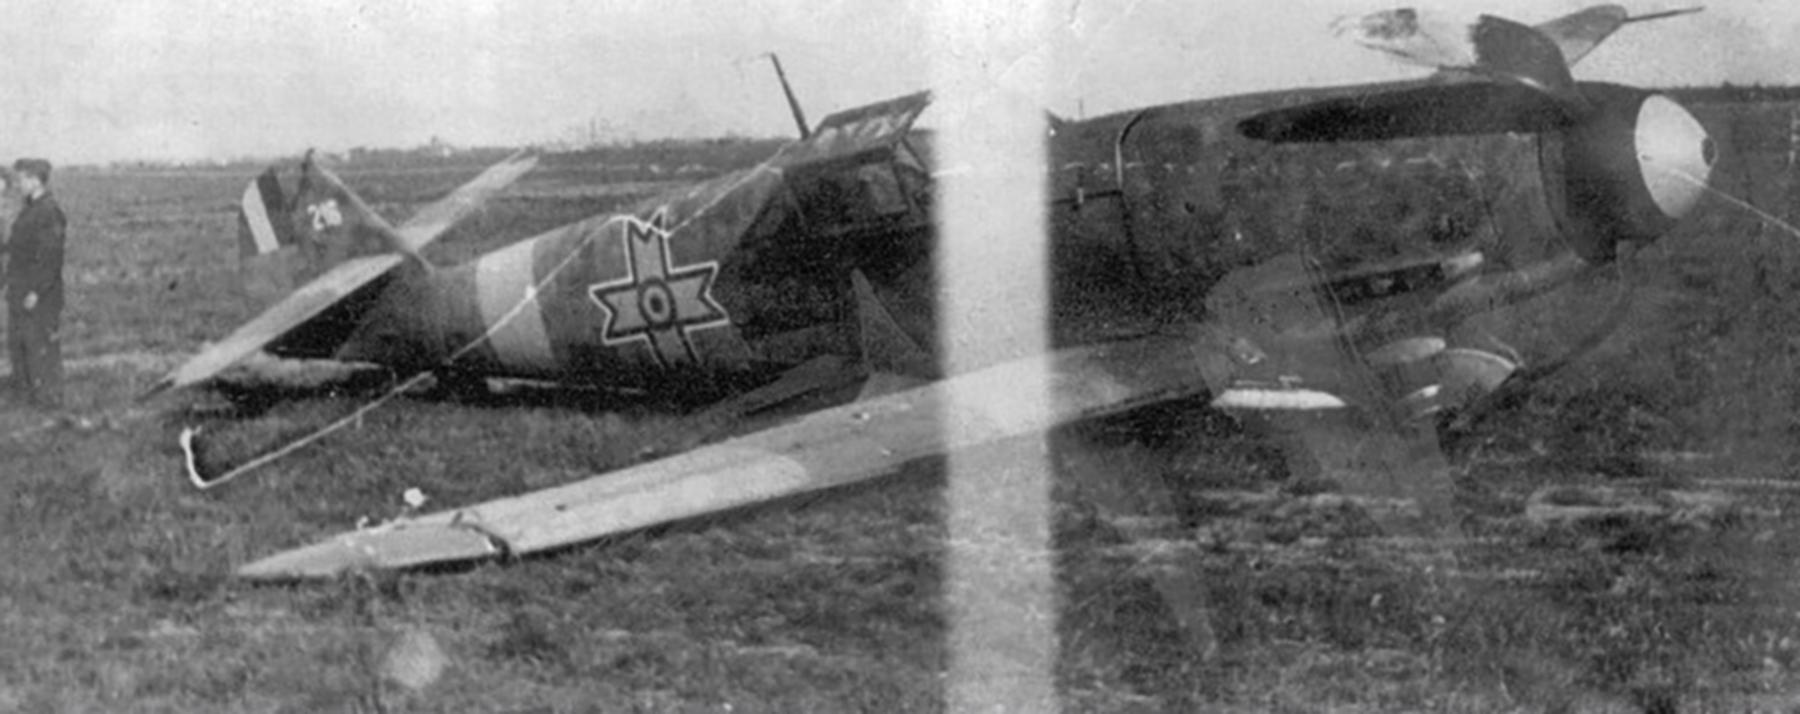 Messerschmitt Bf 109G2 RRAF 7FG White 216 Romania 1942 01